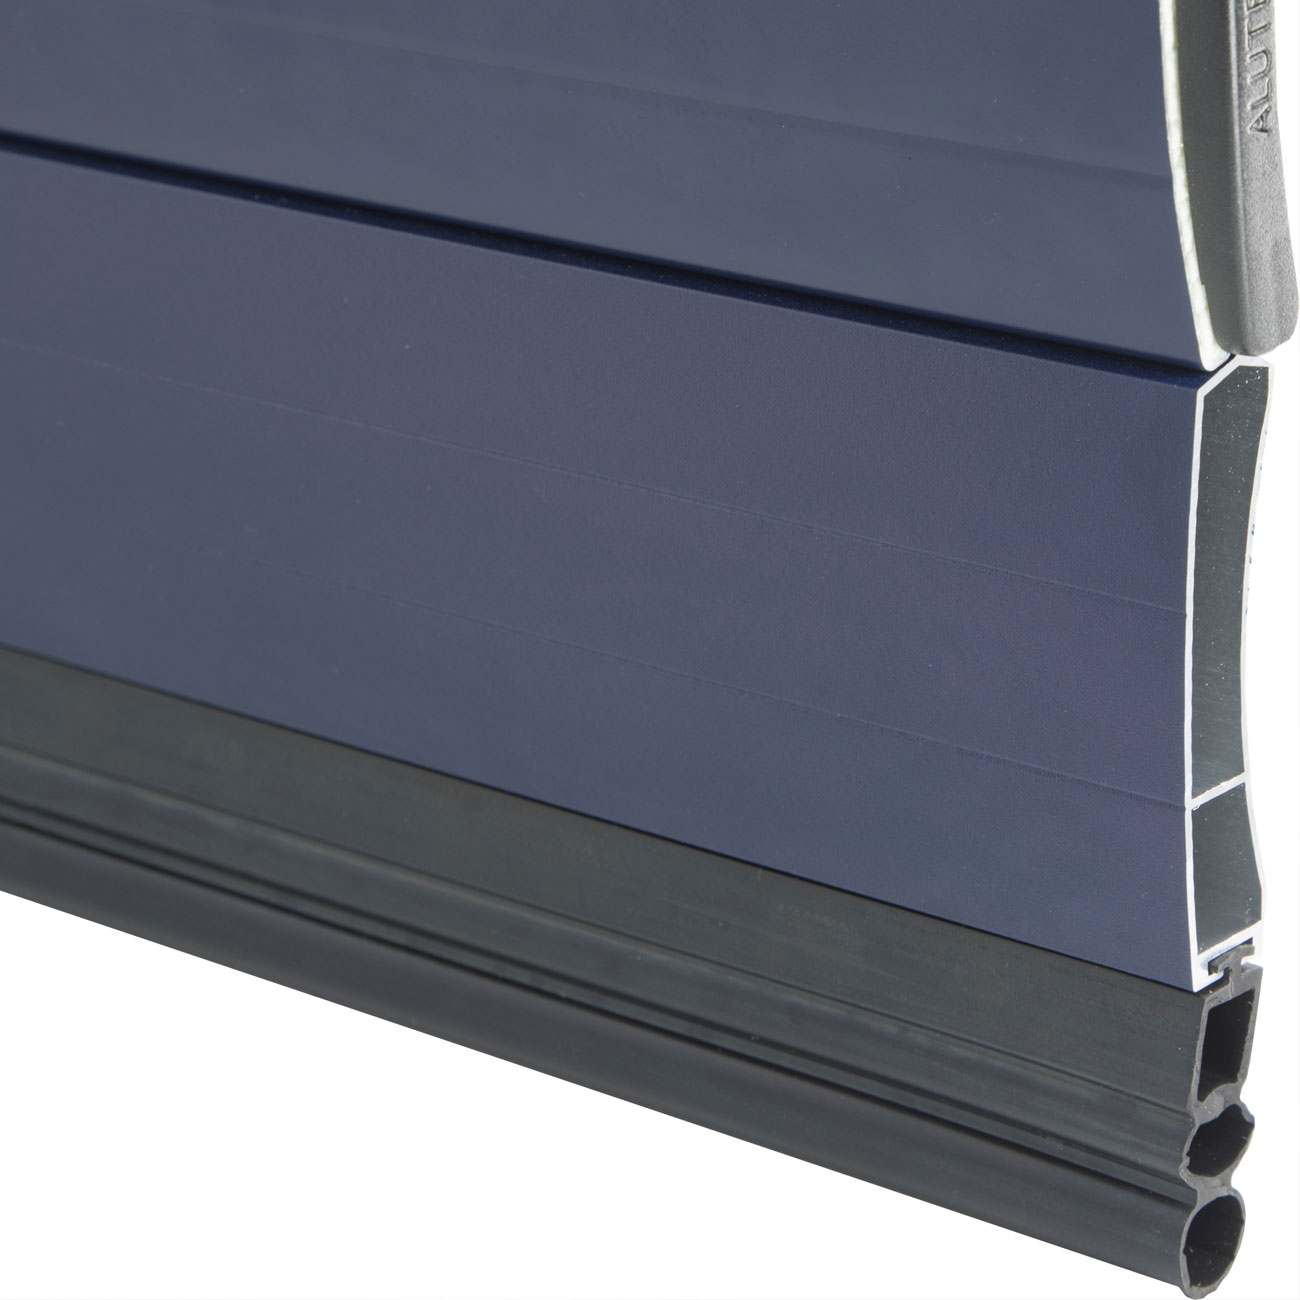 Alluguard 55 compact roller shutter bottom rubber safety edge